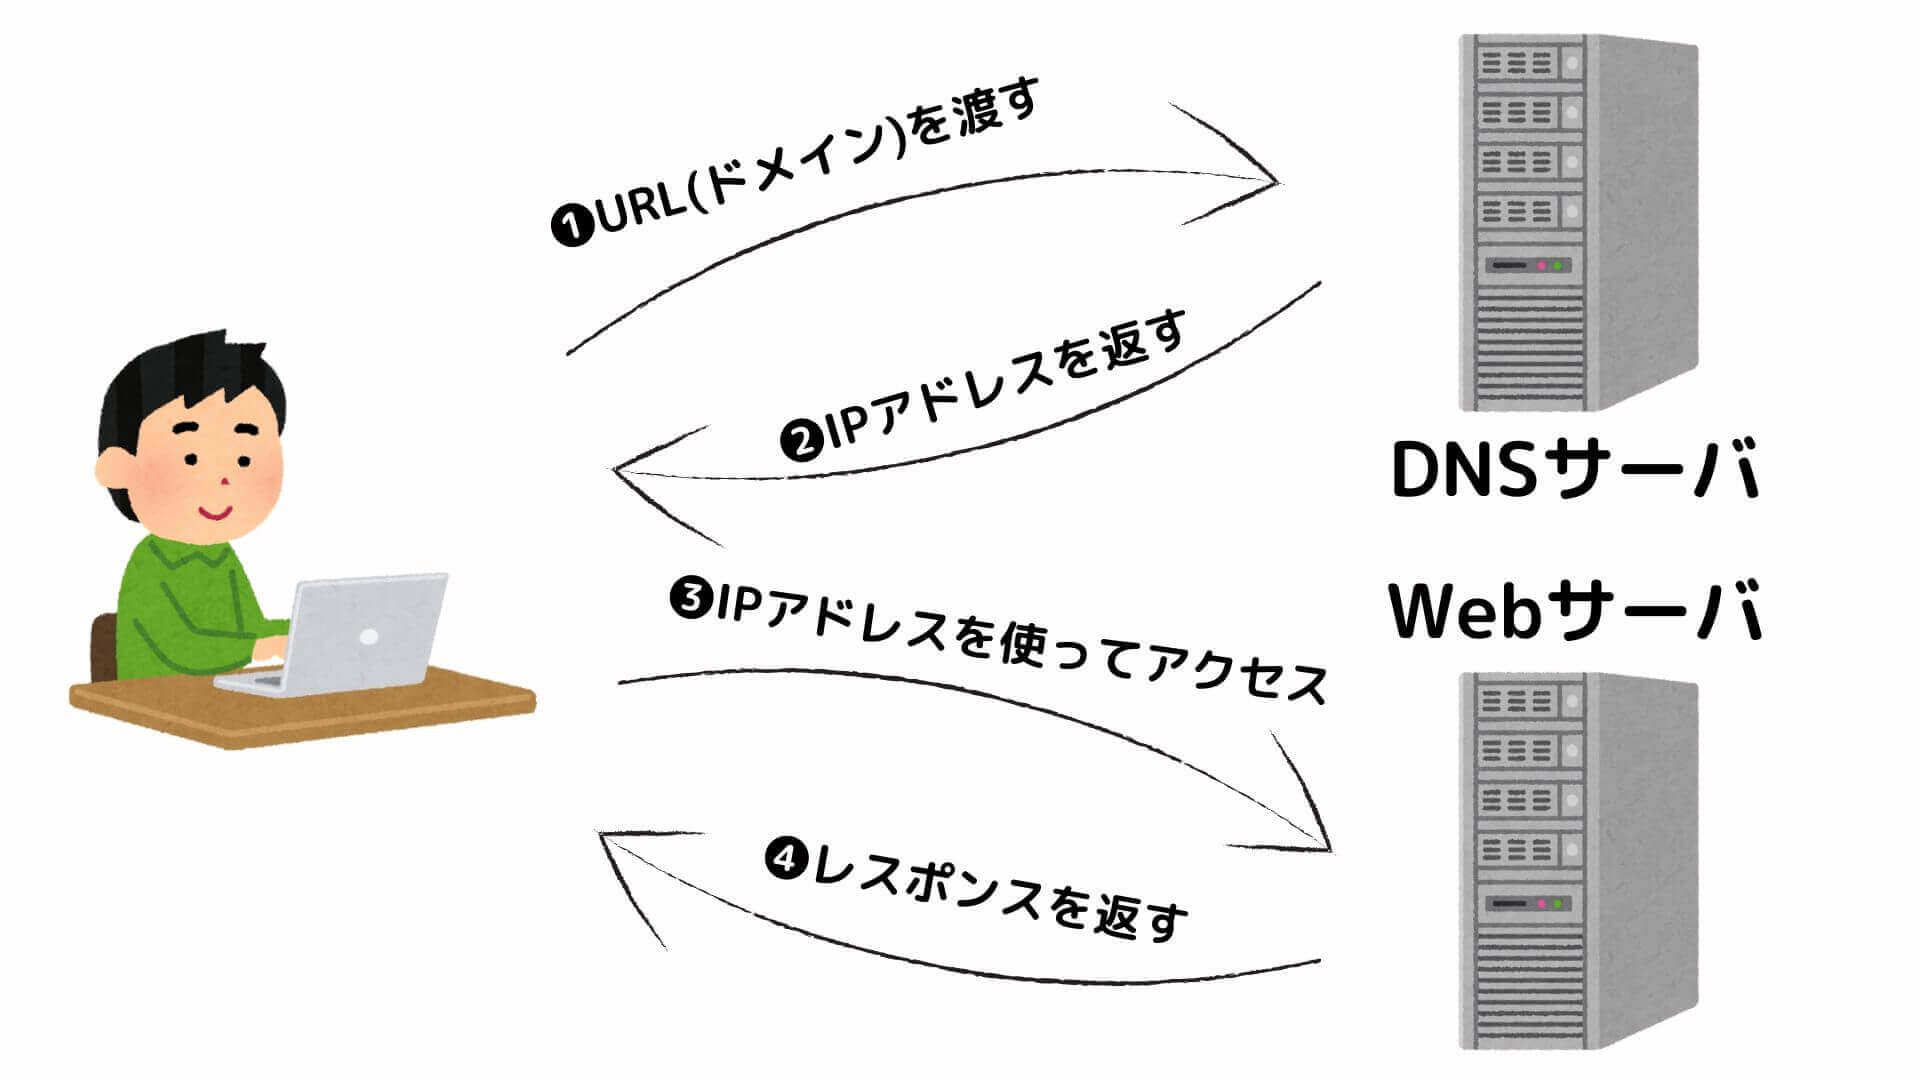 DNSサーバを使って名前解決を行う